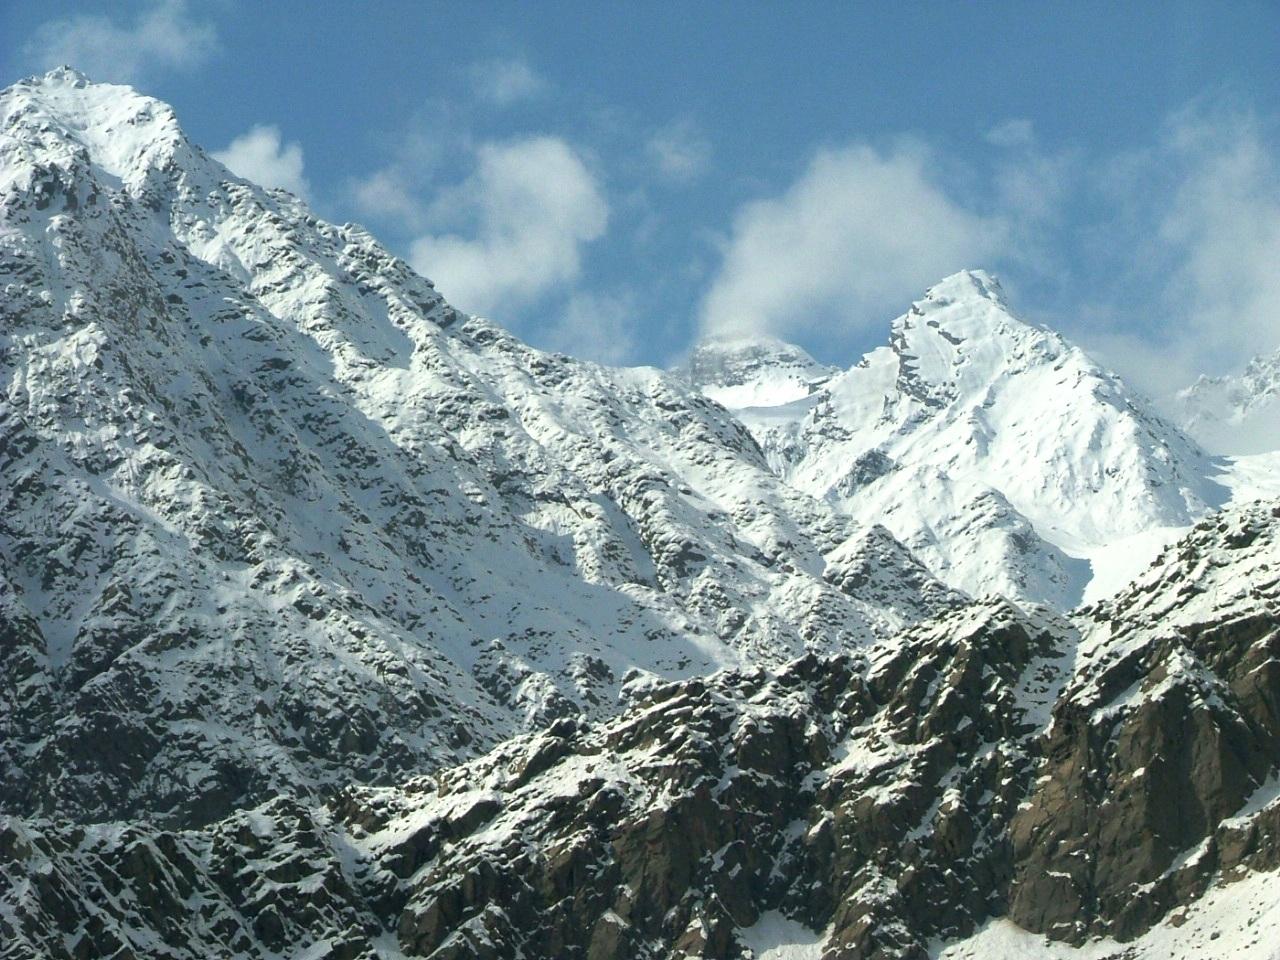 Tajik Mountains above the Pamir Highway